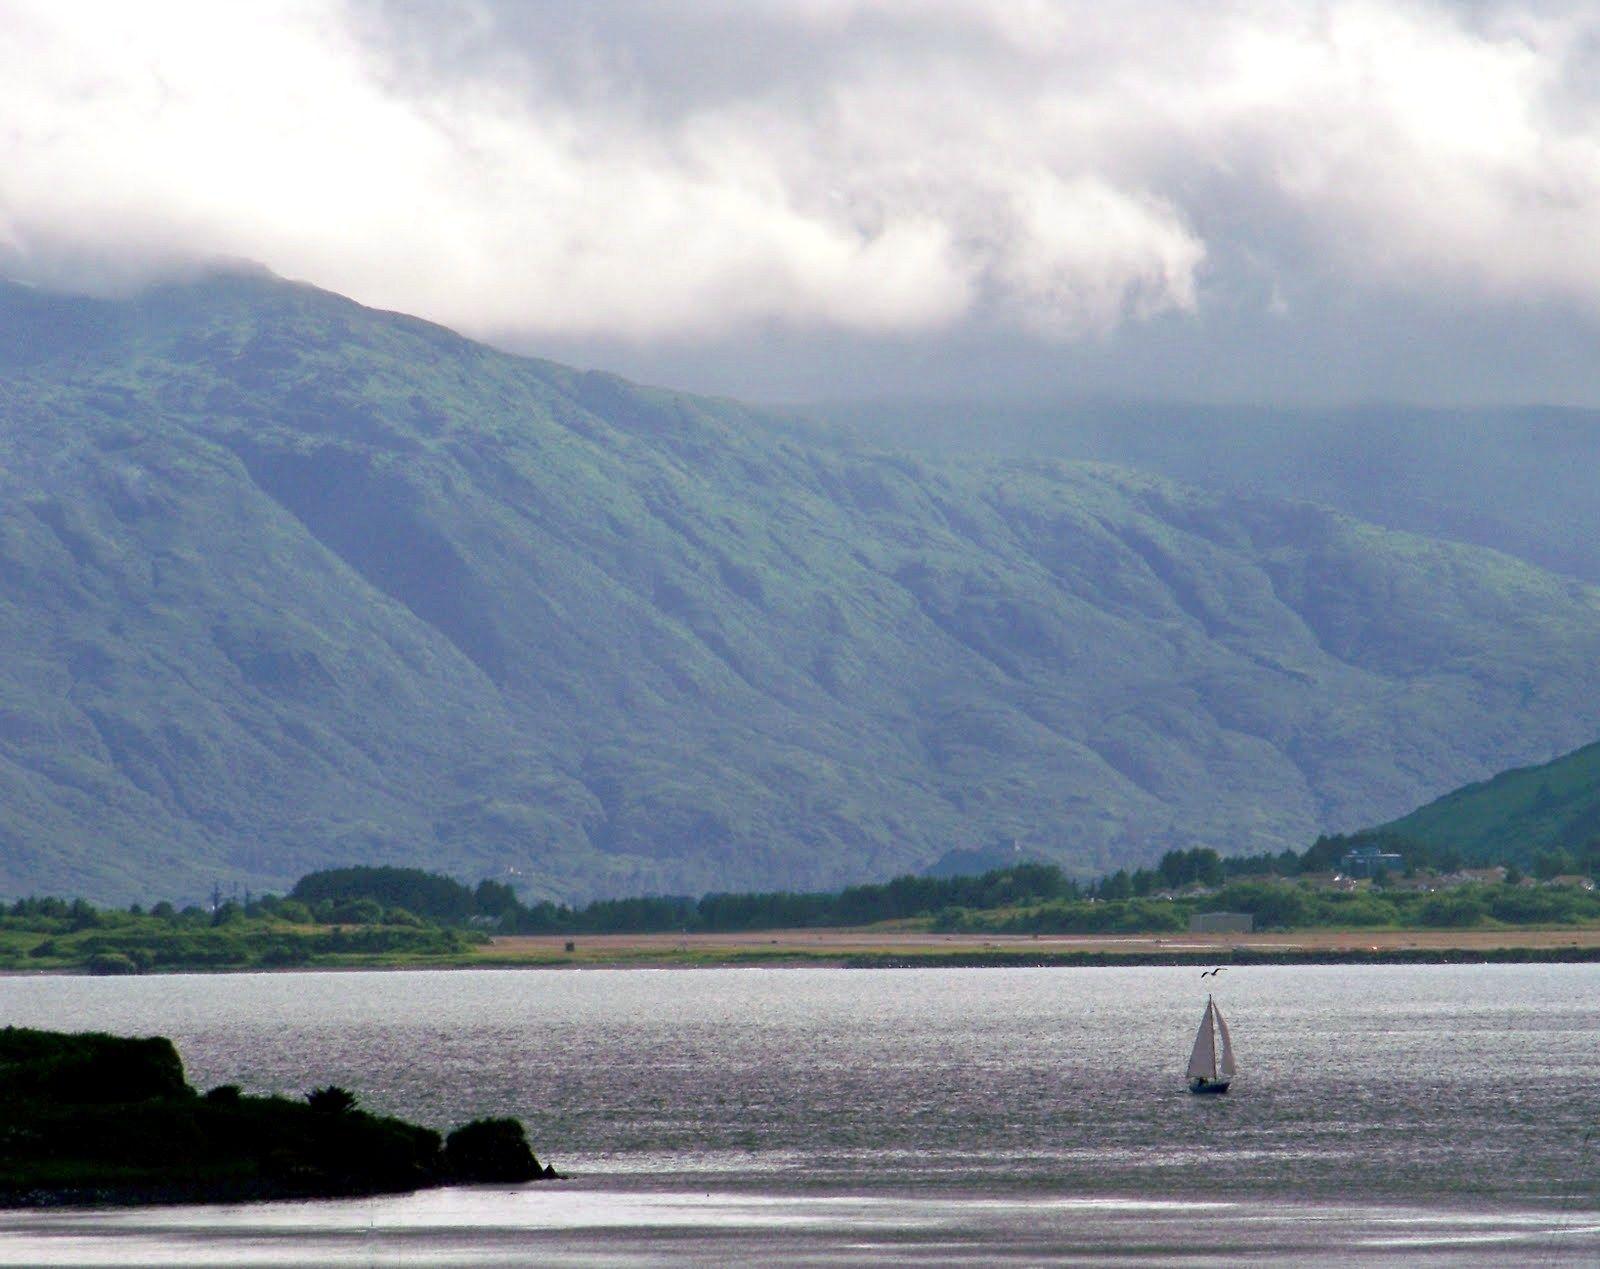 Kodiak Harbor  (photo by jone suleski)